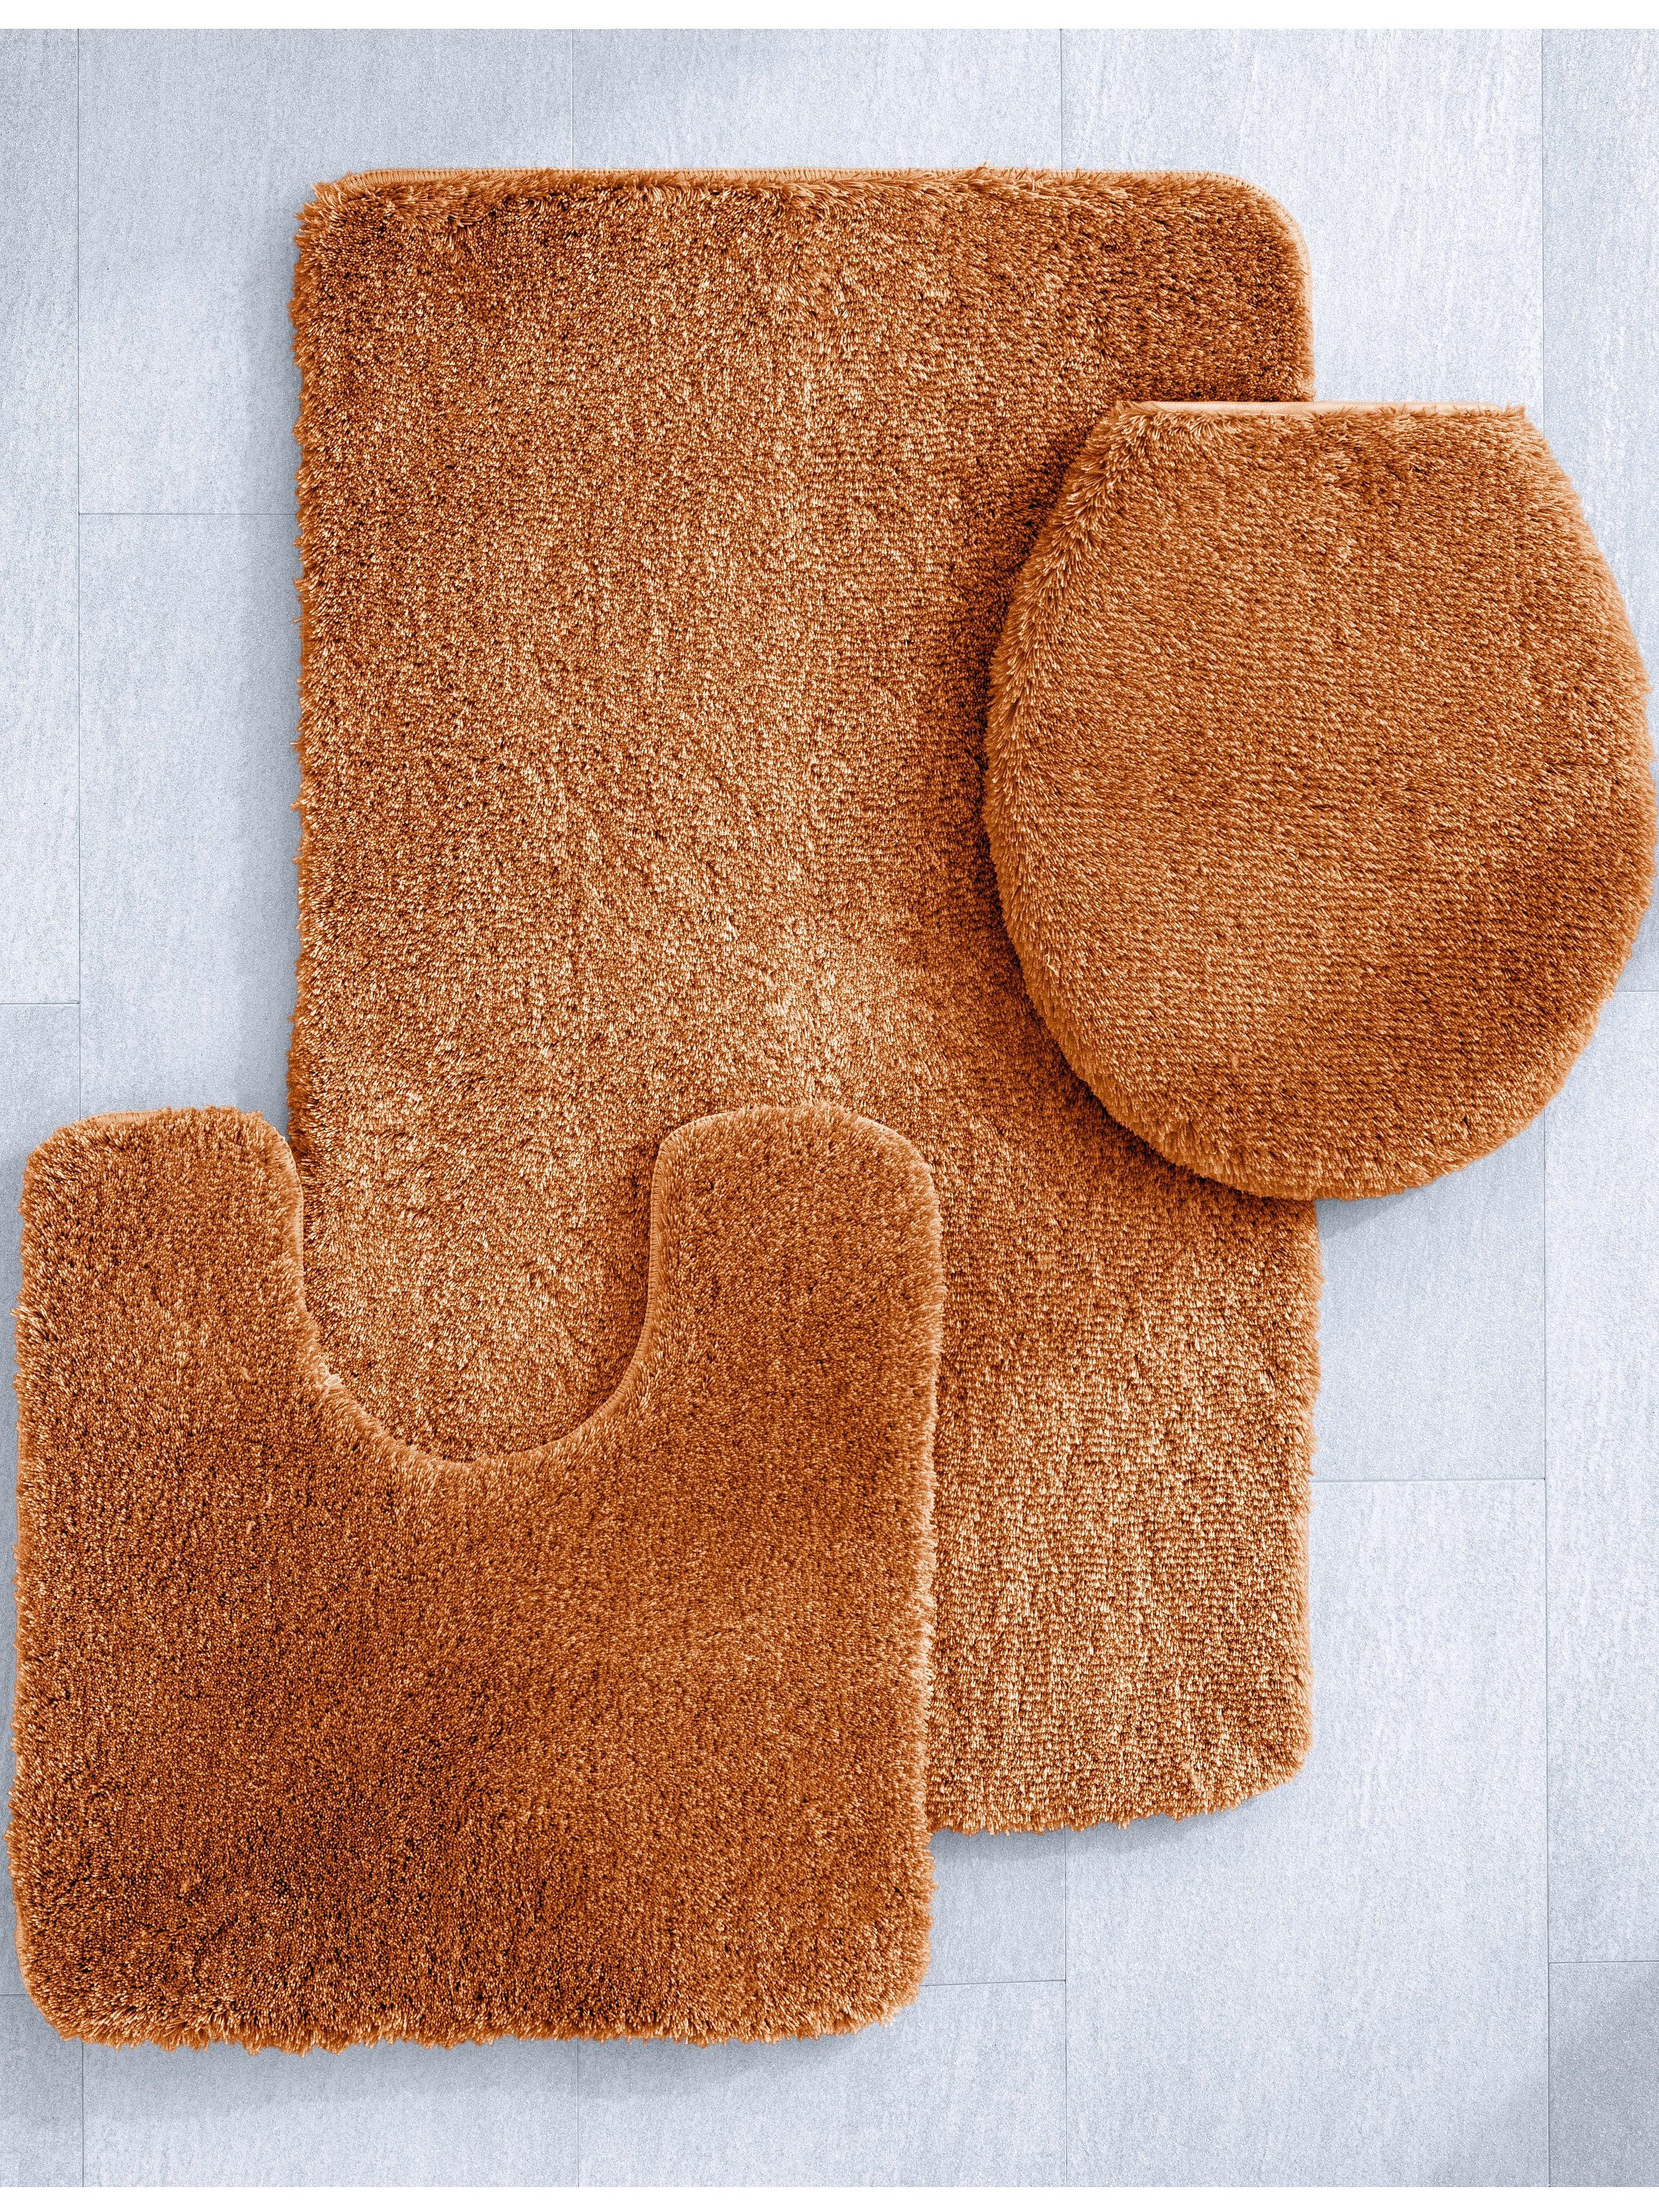 Kleine Wolke Relax badmat b55xd65x3cm, roestbruin